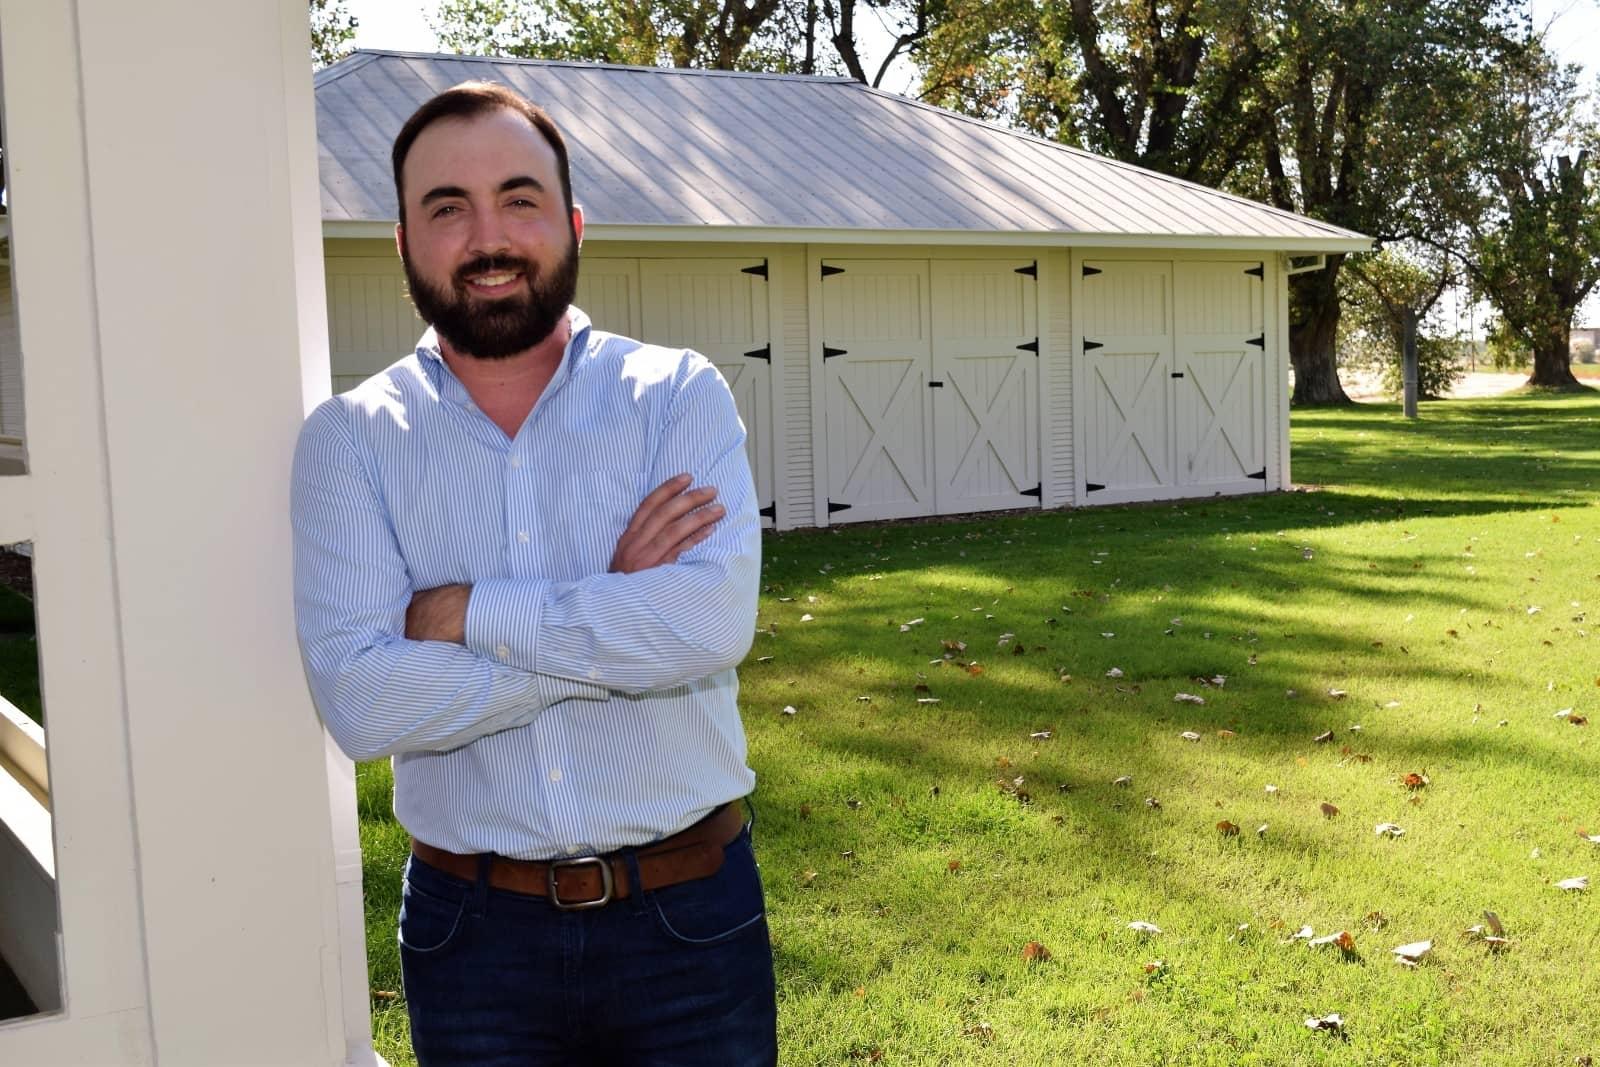 farm Calif. Dairy Farm Goes Greener With 2 MW Solar Project